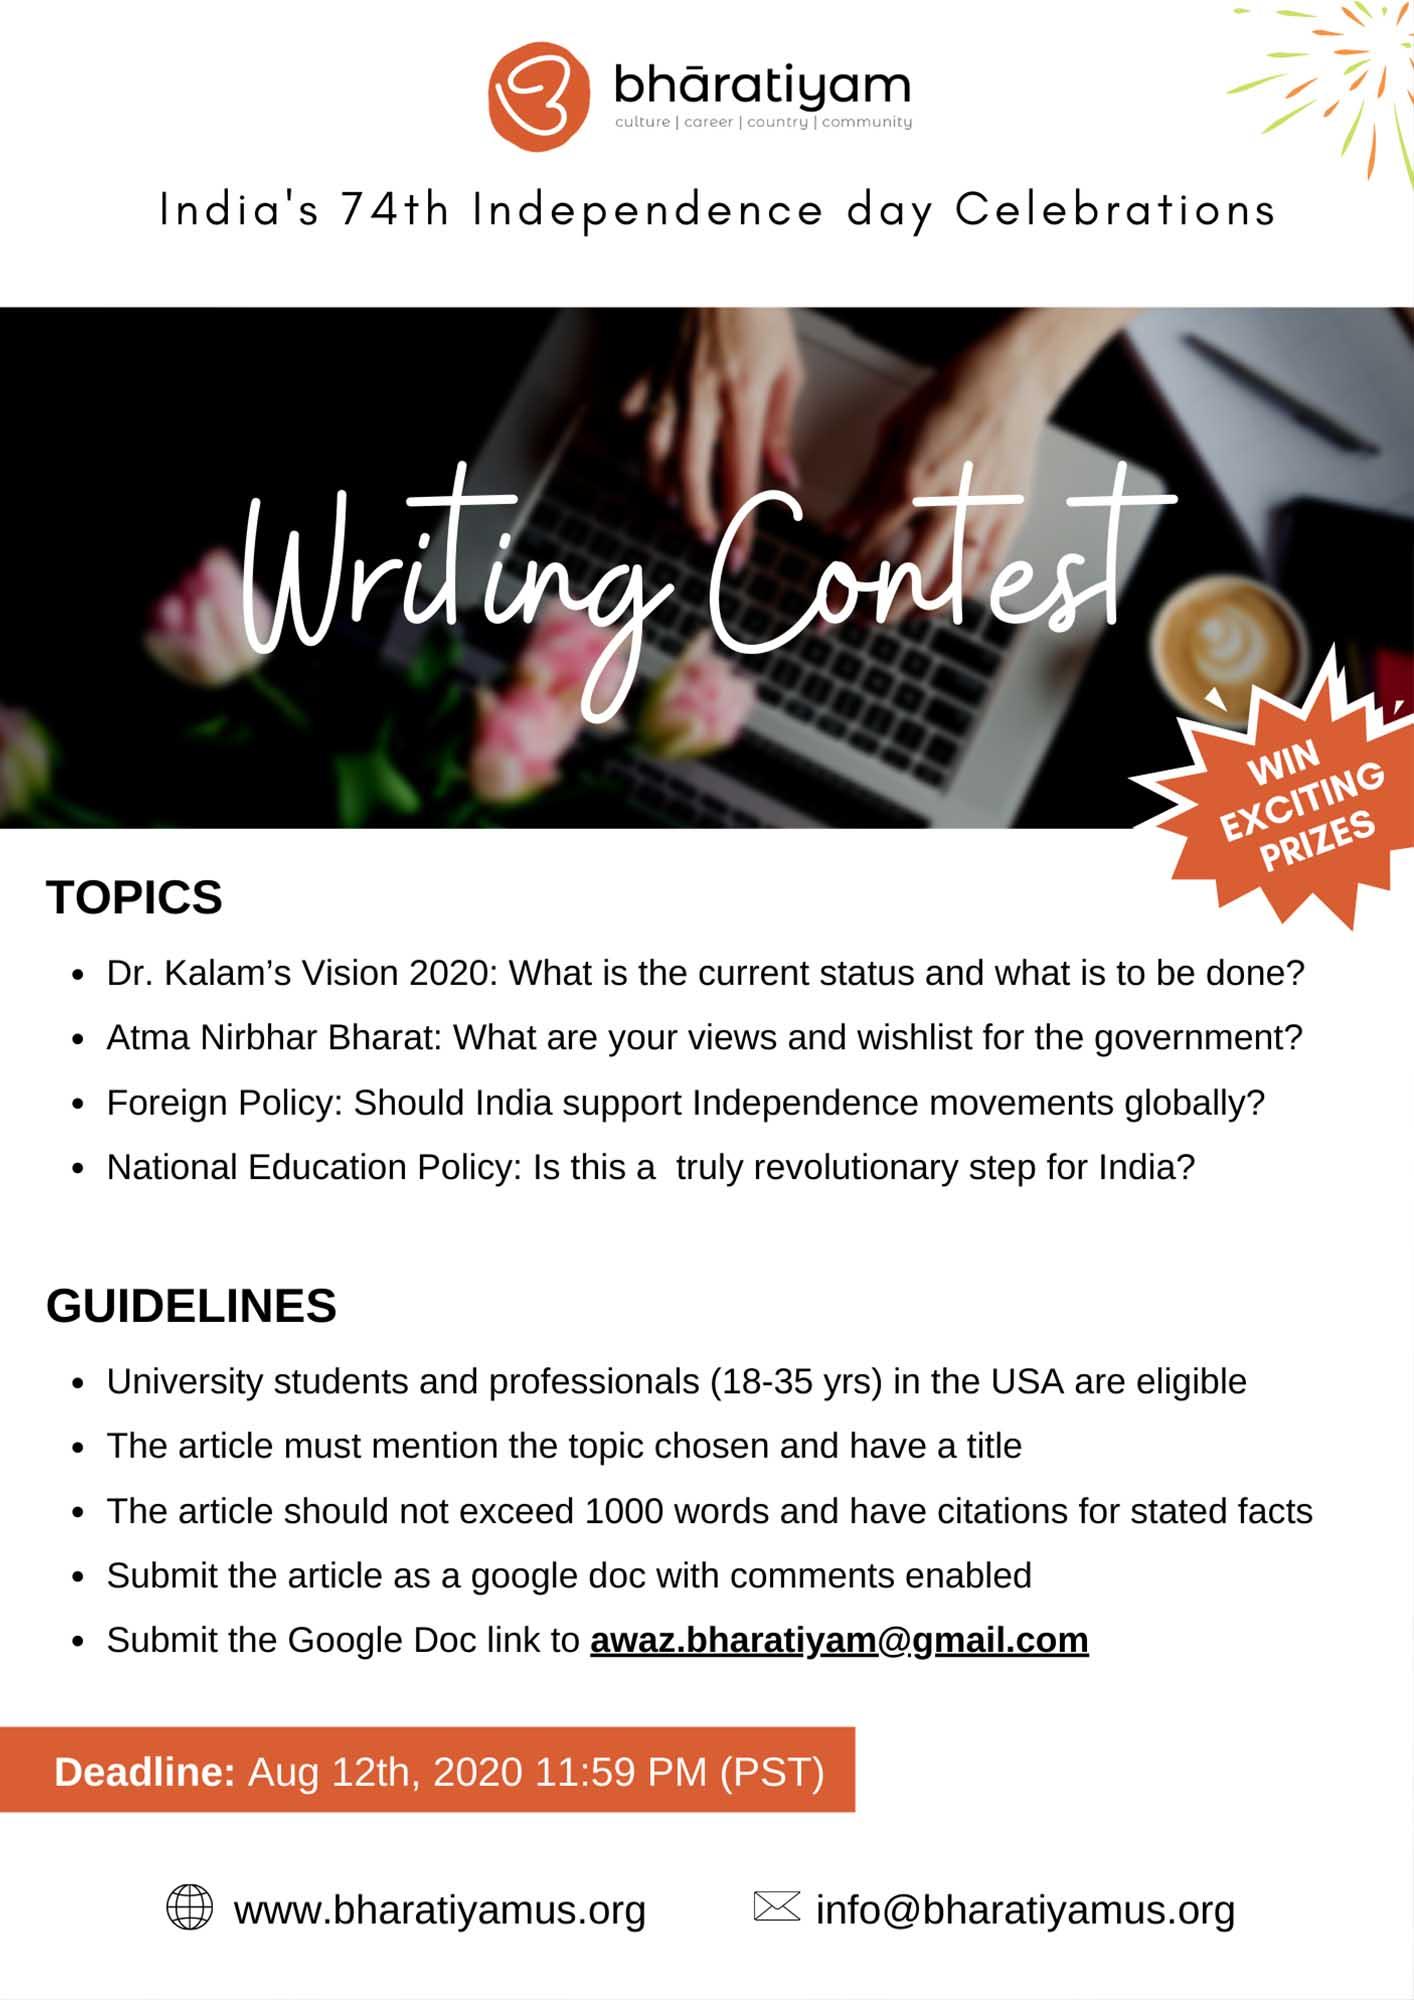 Writing Contest